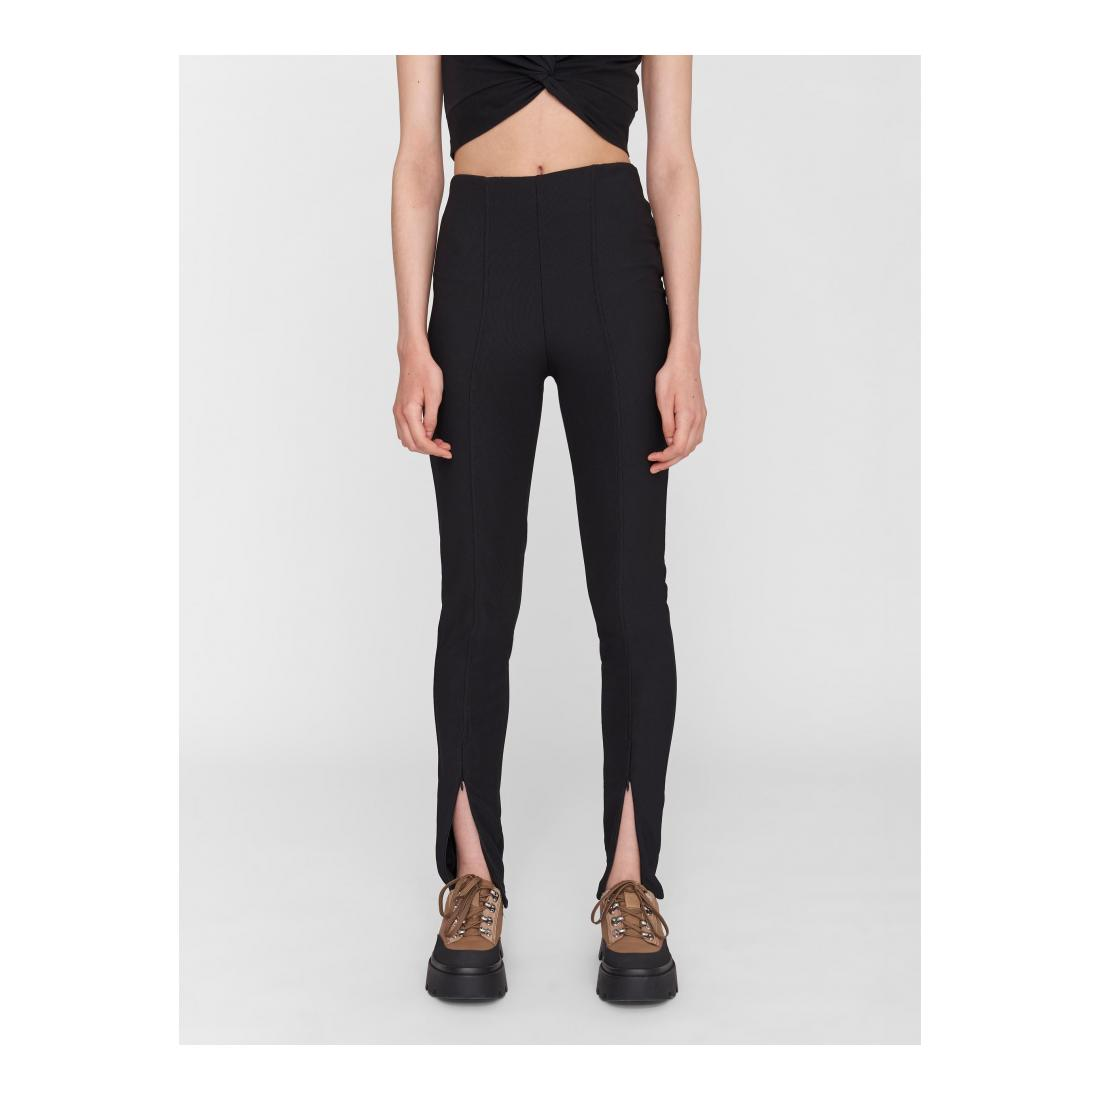 Noisy May Joggingpants/Leggins Damen NMSALLIE HW FRONT DETAIL